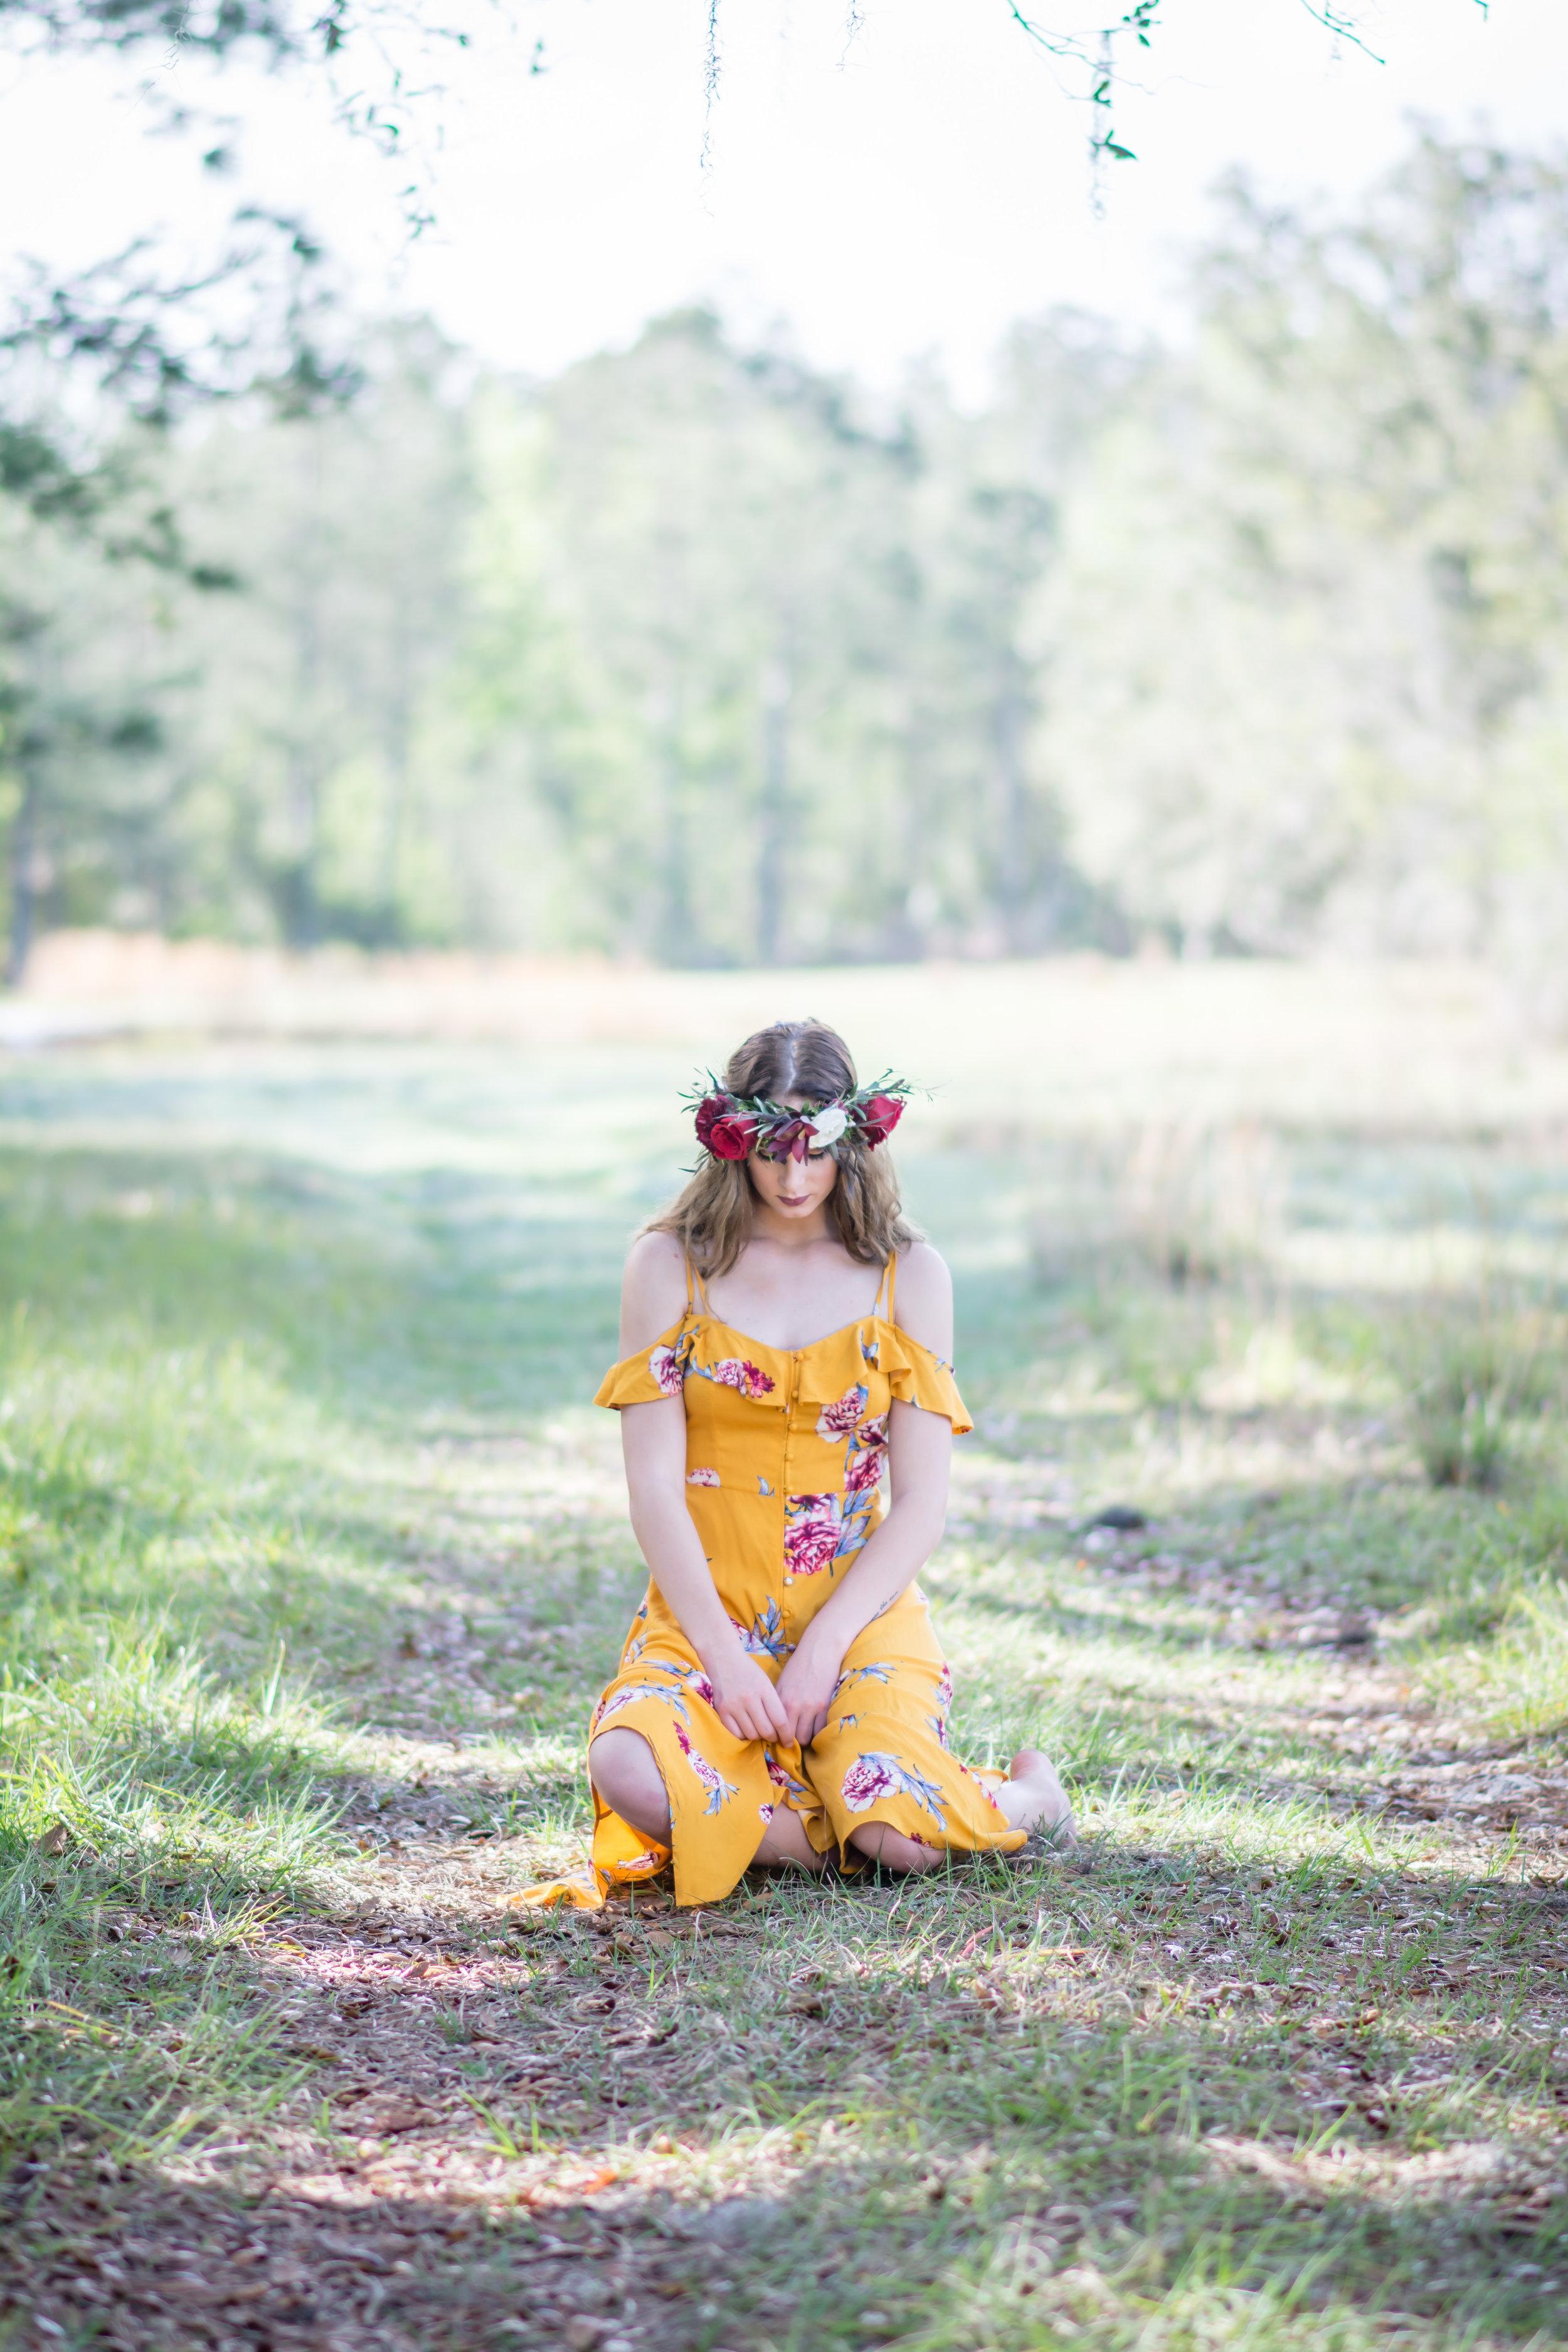 floral-headpiece-fashion-photoshoot-geneva-central-florida-photographer-yanitza-ninett-30.jpg